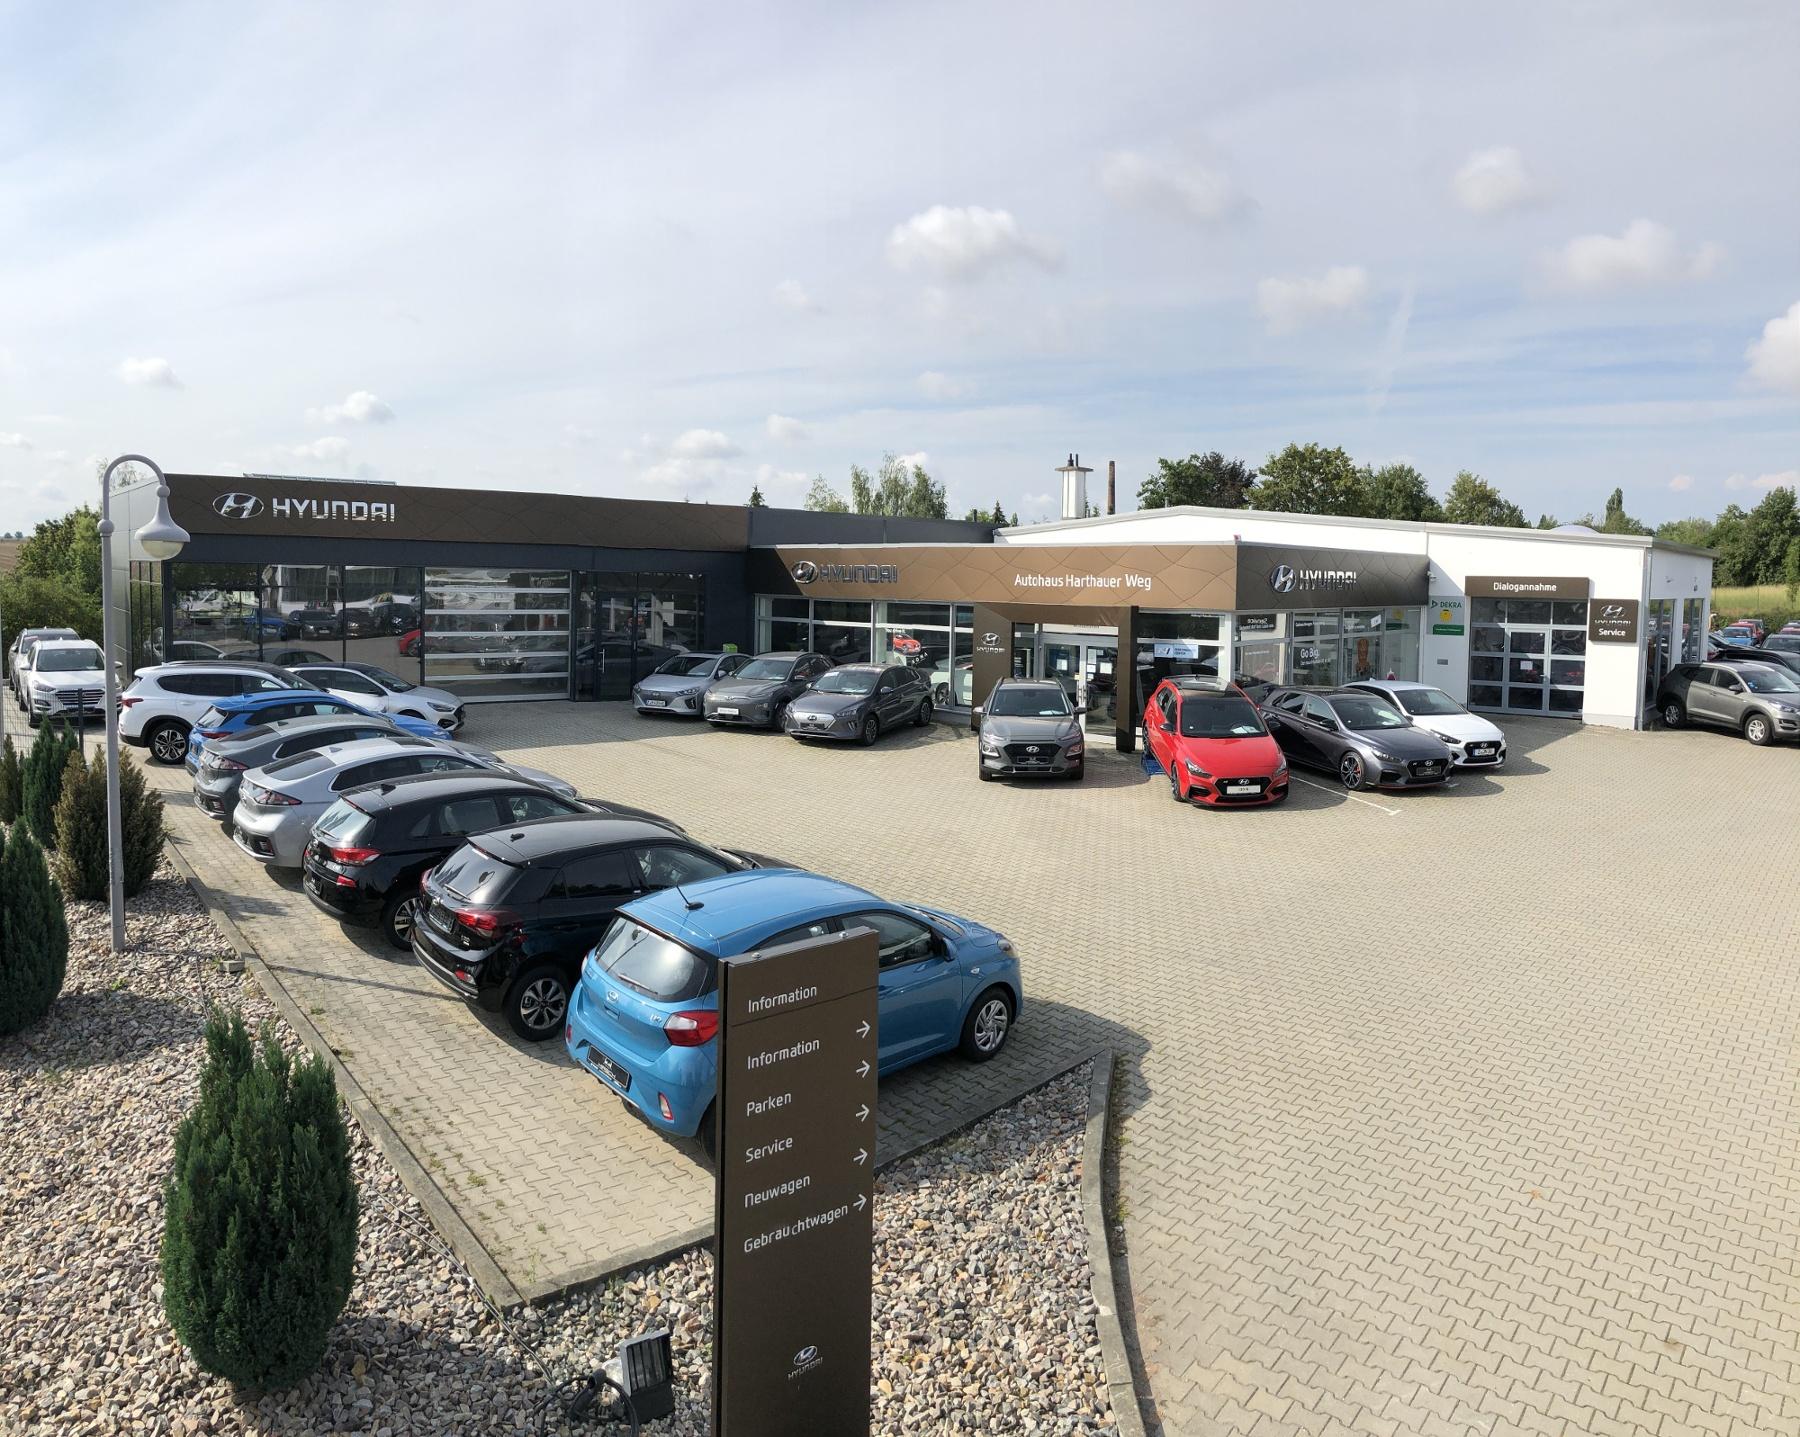 Hyundai Autohaus Harthauer Weg Aussenaufnahme